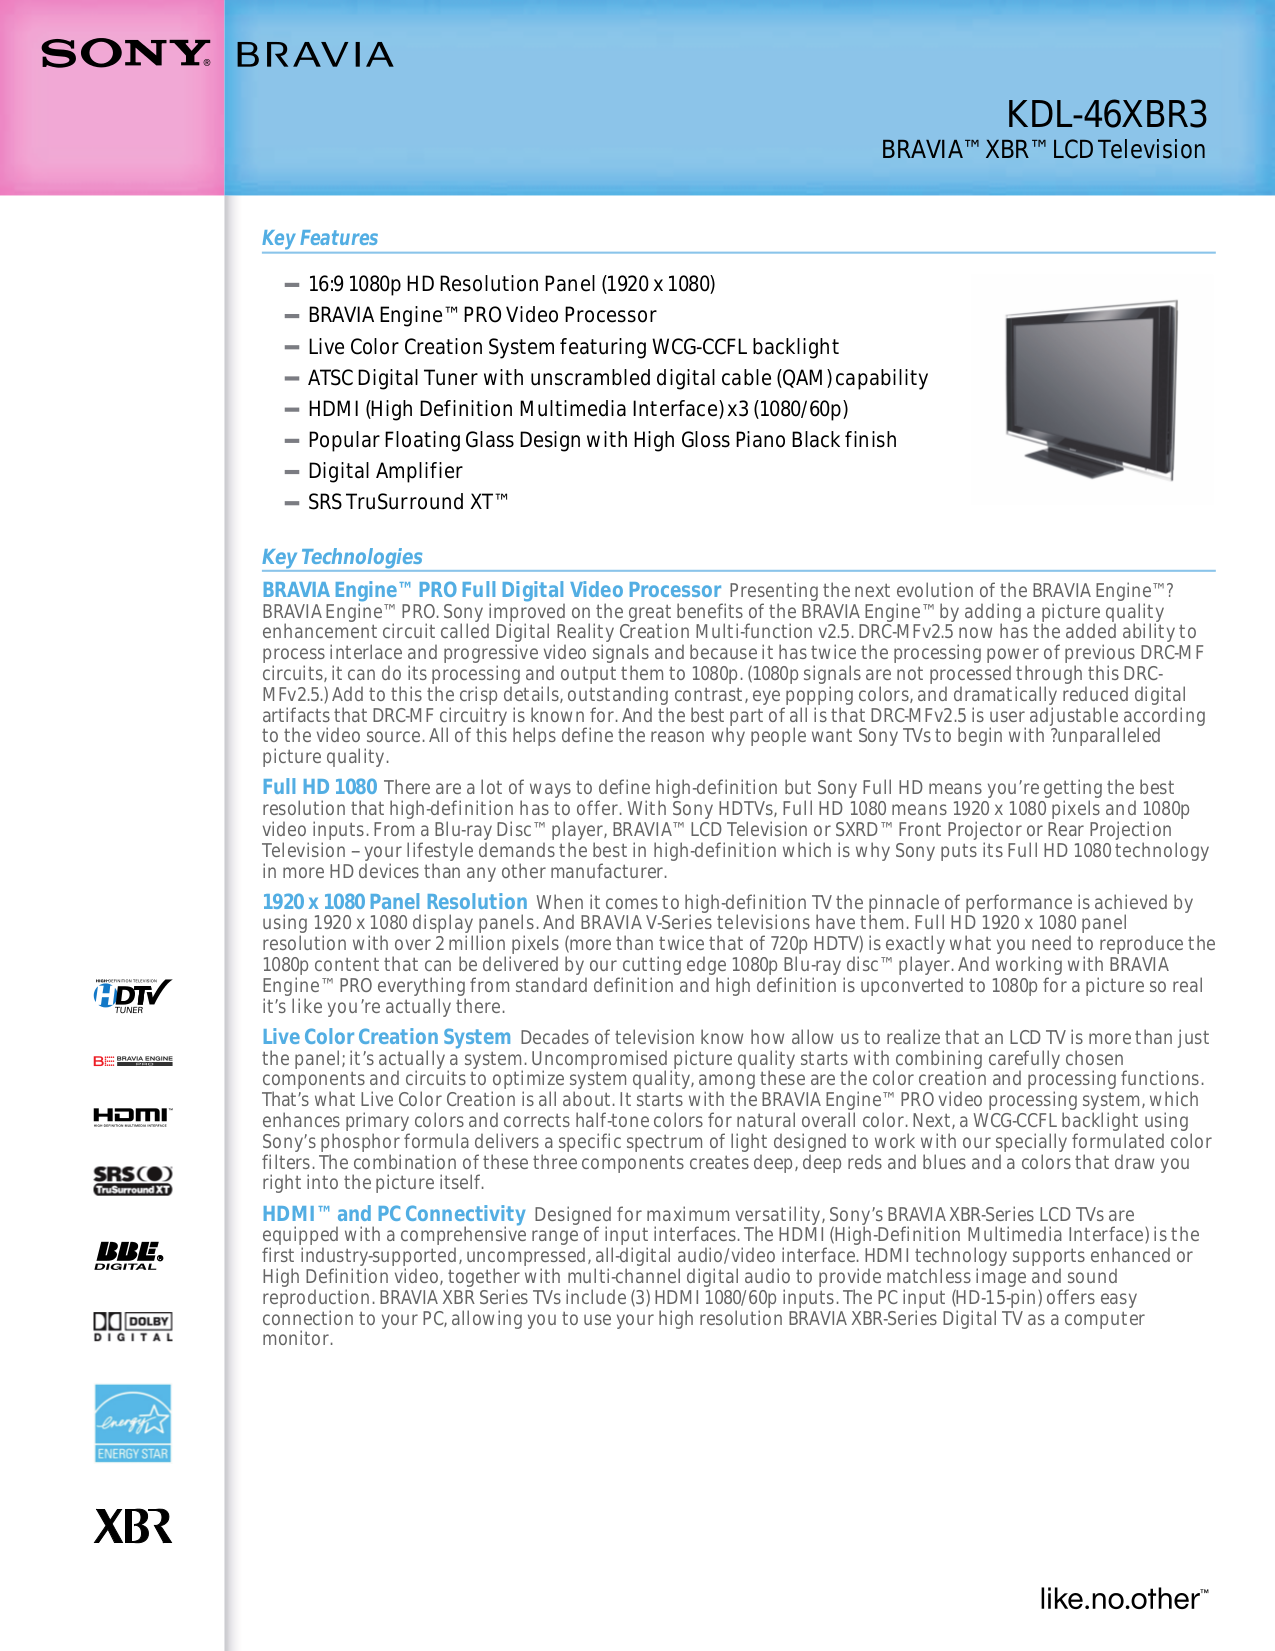 download free pdf for sony bravia kdl 46xbr3 tv manual rh umlib com Sony BRAVIA Remote Manual Sony BRAVIA 46 User Manual